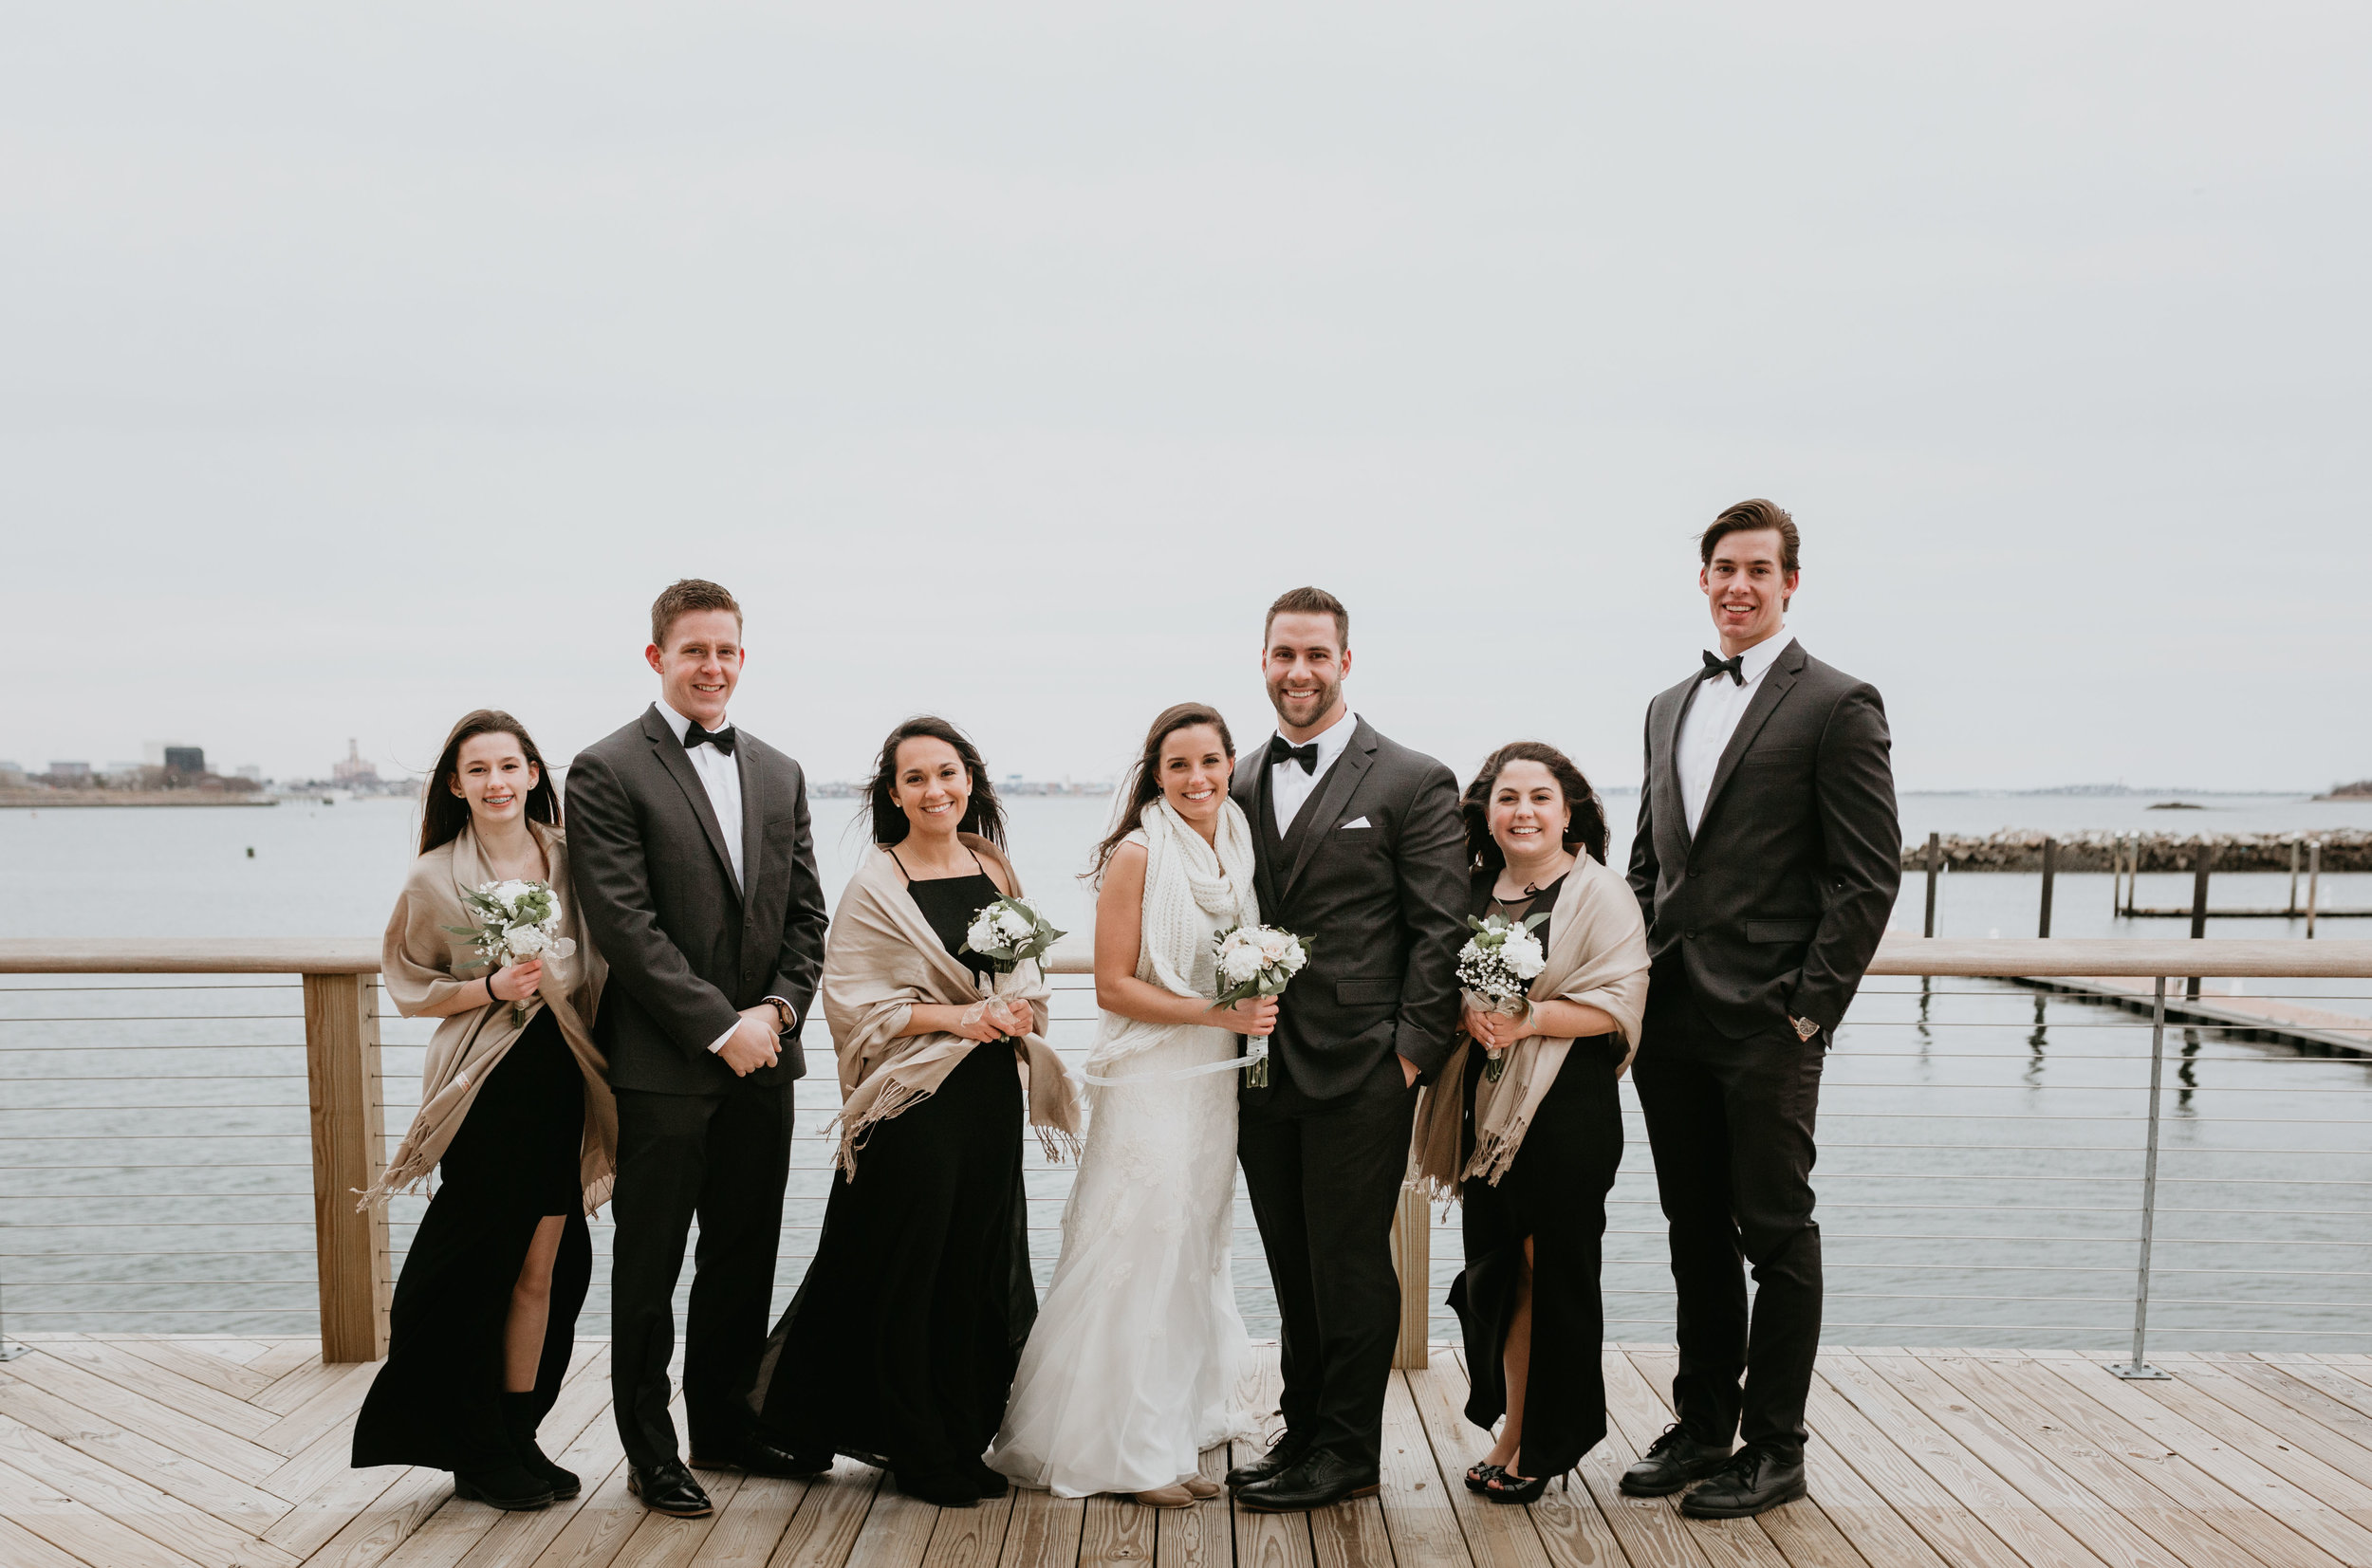 nicole-daacke-photography-boston-massachusetts-seaside-intimate-winter-wedding-photographer-33.jpg